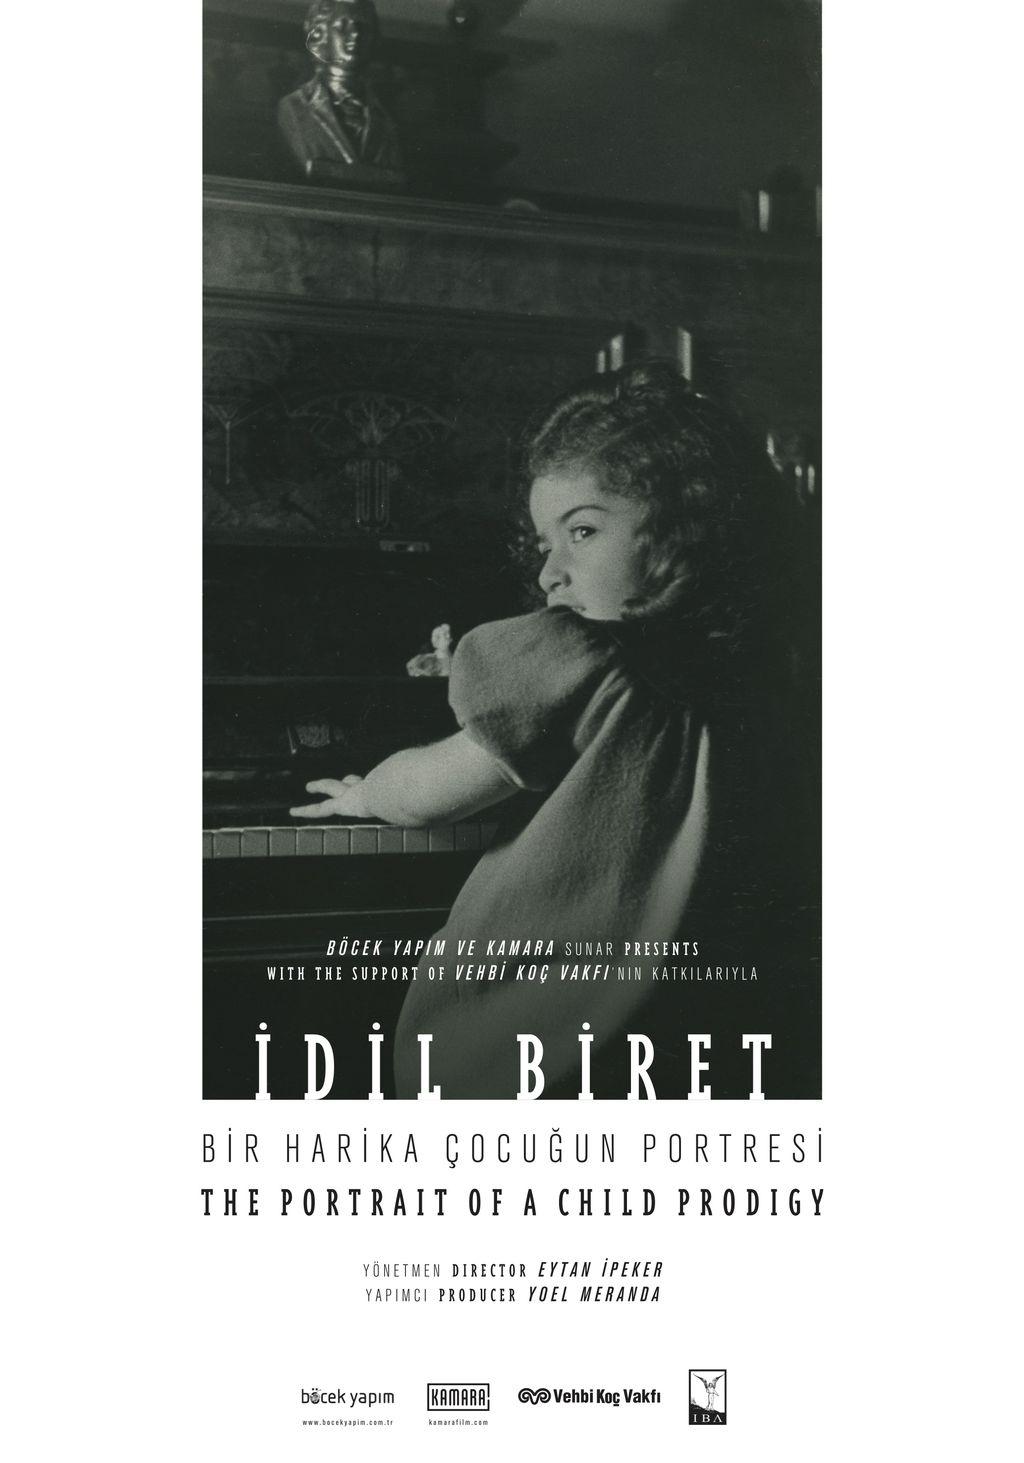 İDİL BİRET: BİR HARİKA ÇOCUĞUN PORTRESİ / IDIL BIRET: THE PORTRAIT OF A CHILD PRODIGY